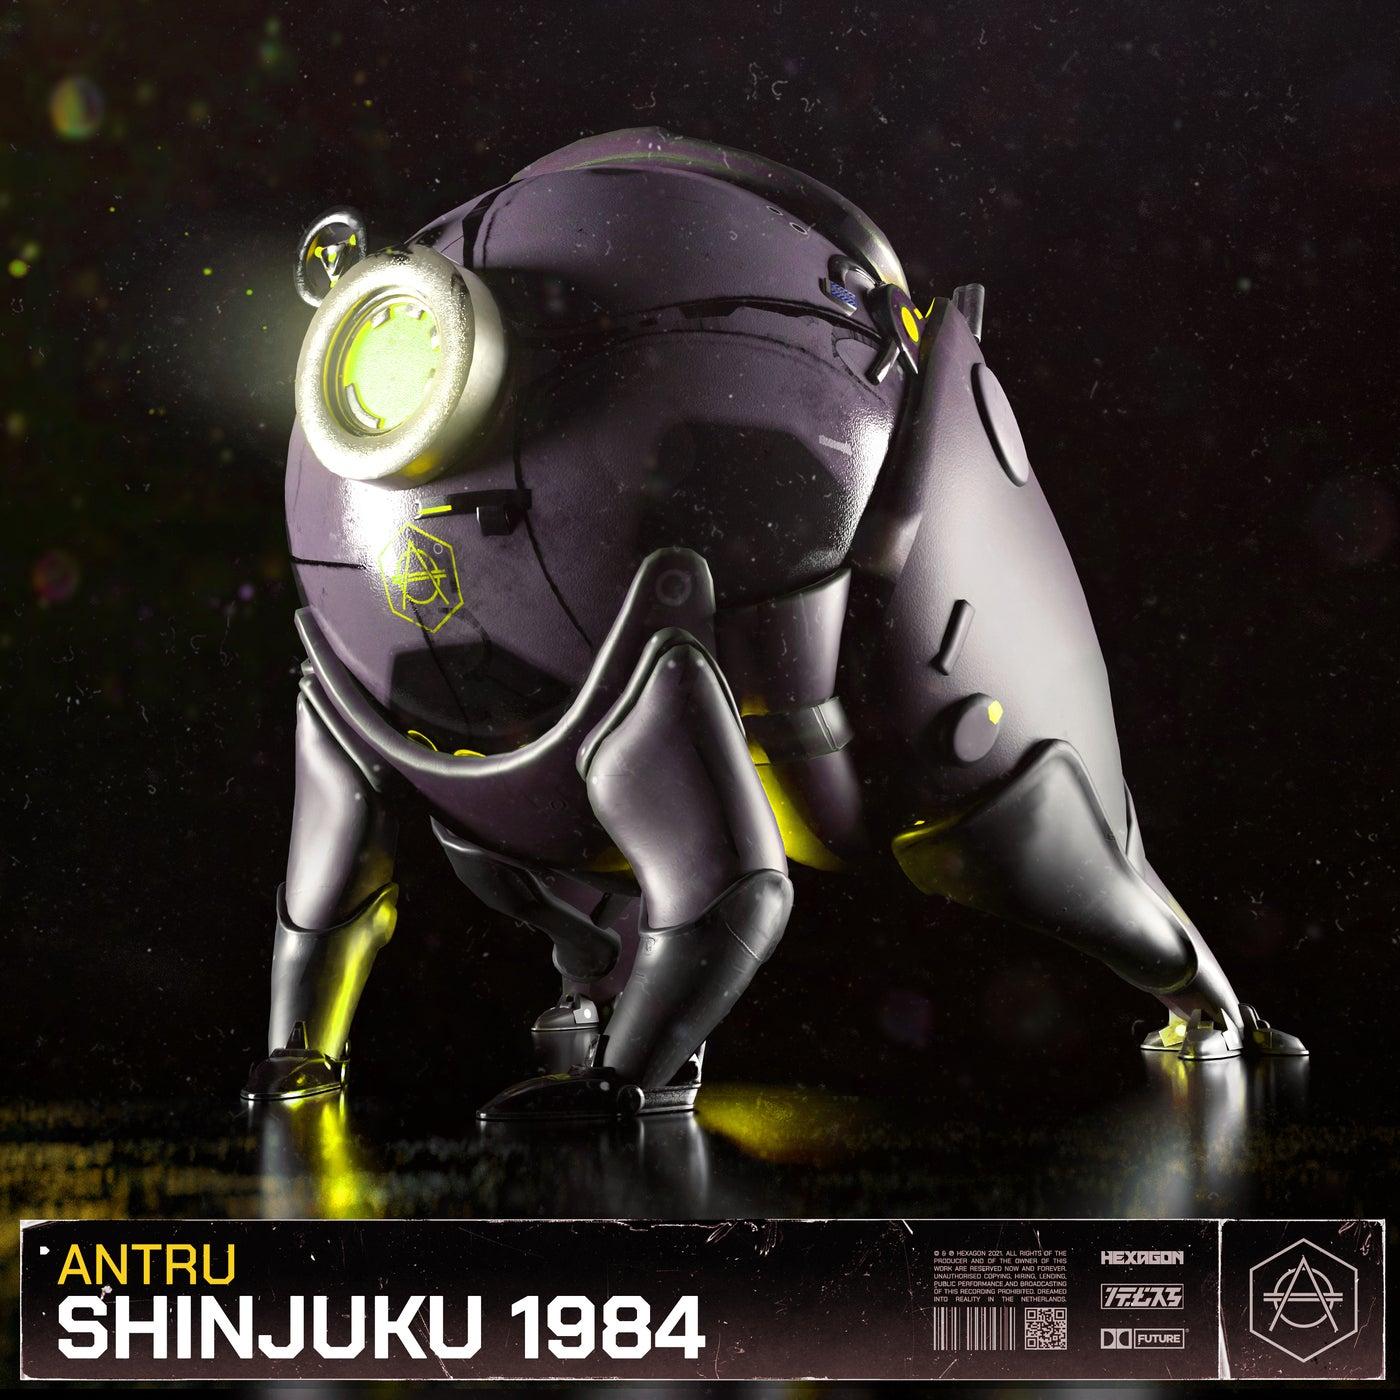 Shinjuku 1984 (Extended Mix)